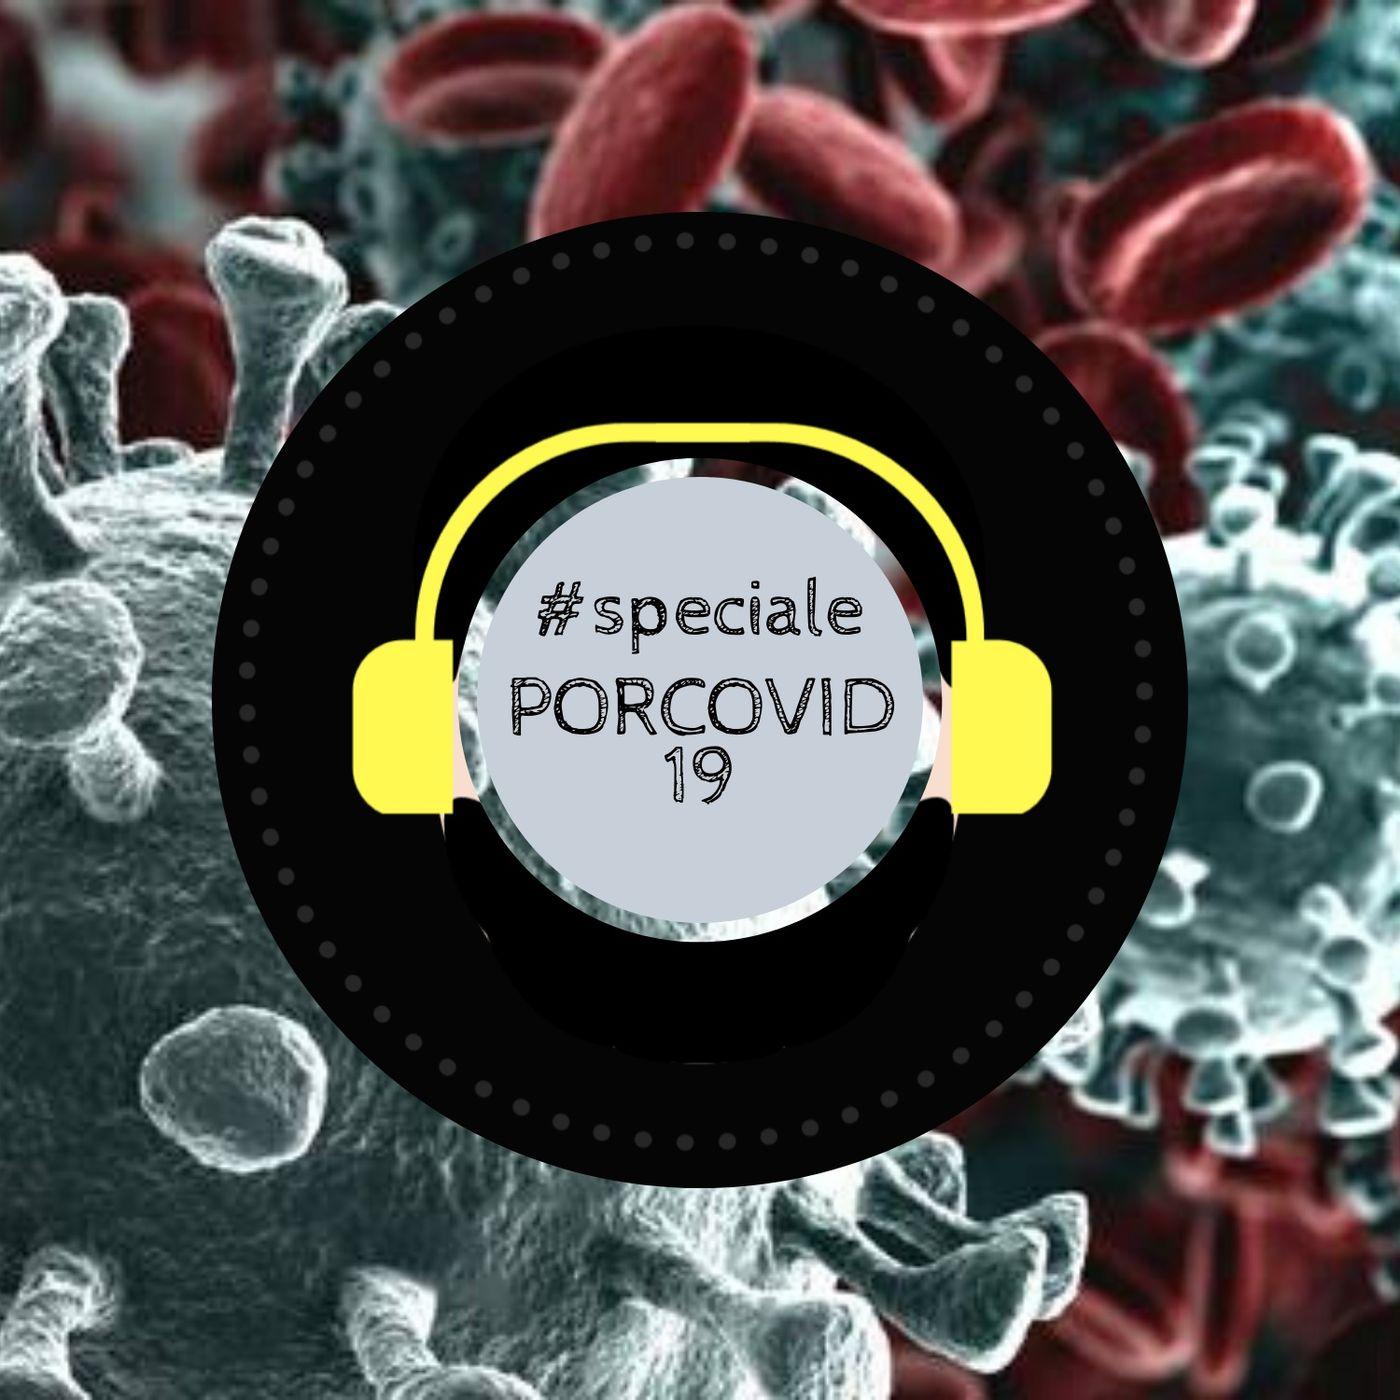 #Speciale - Porcovid-19